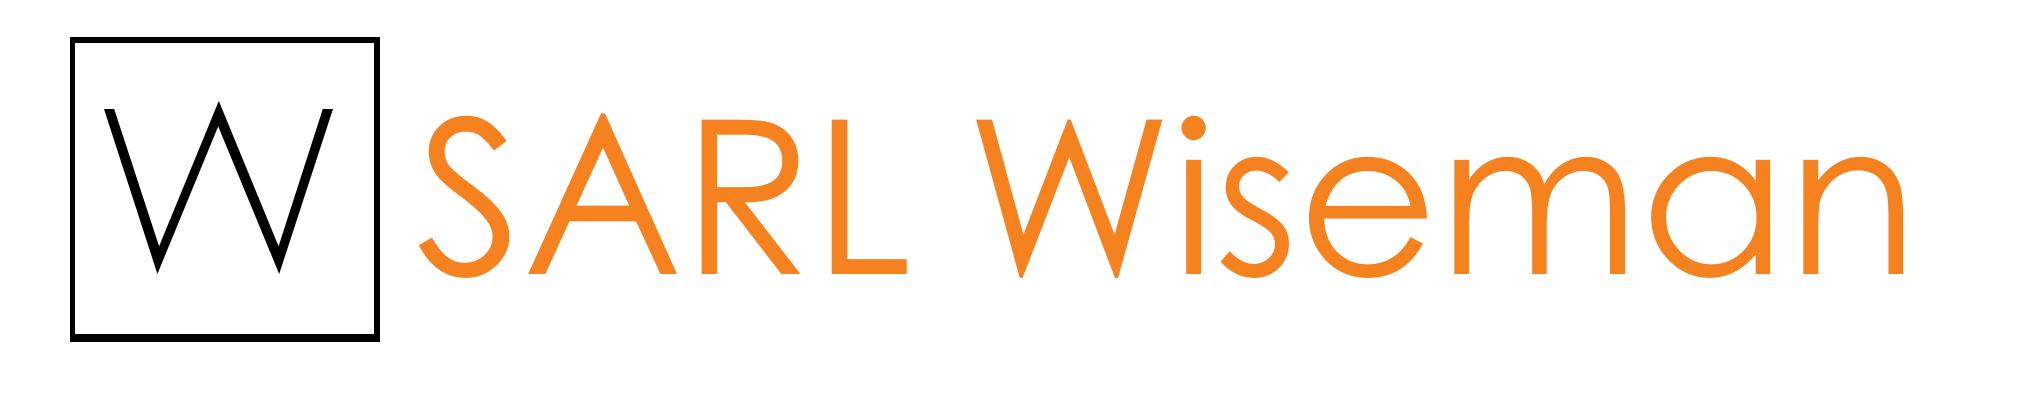 SARL Wiseman Verified Logo